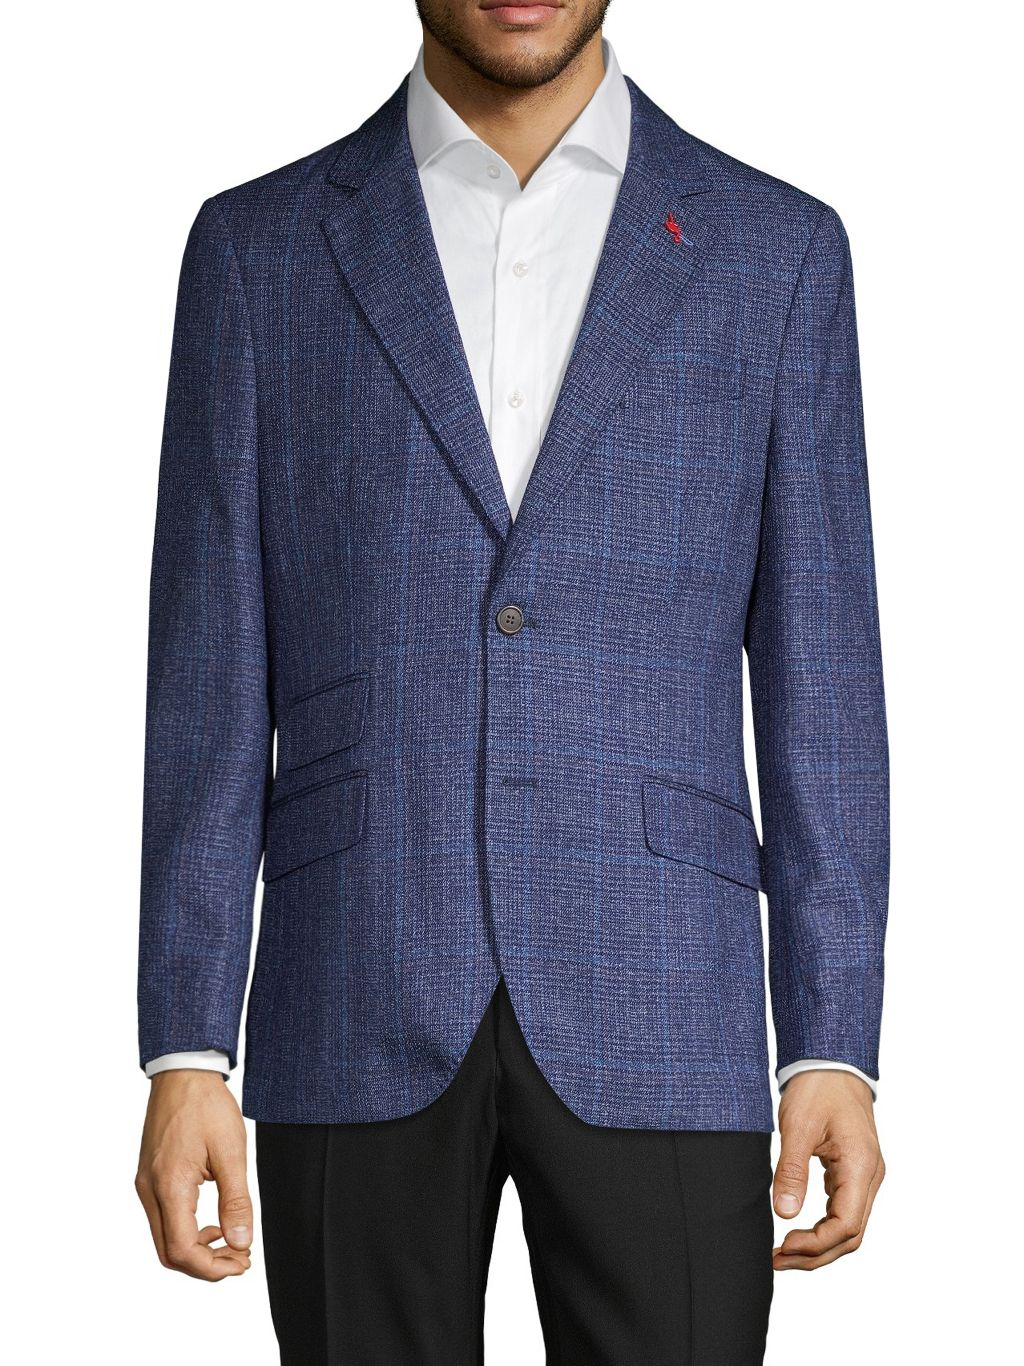 TailorByrd Standard-Fit Plaid Sportcoat